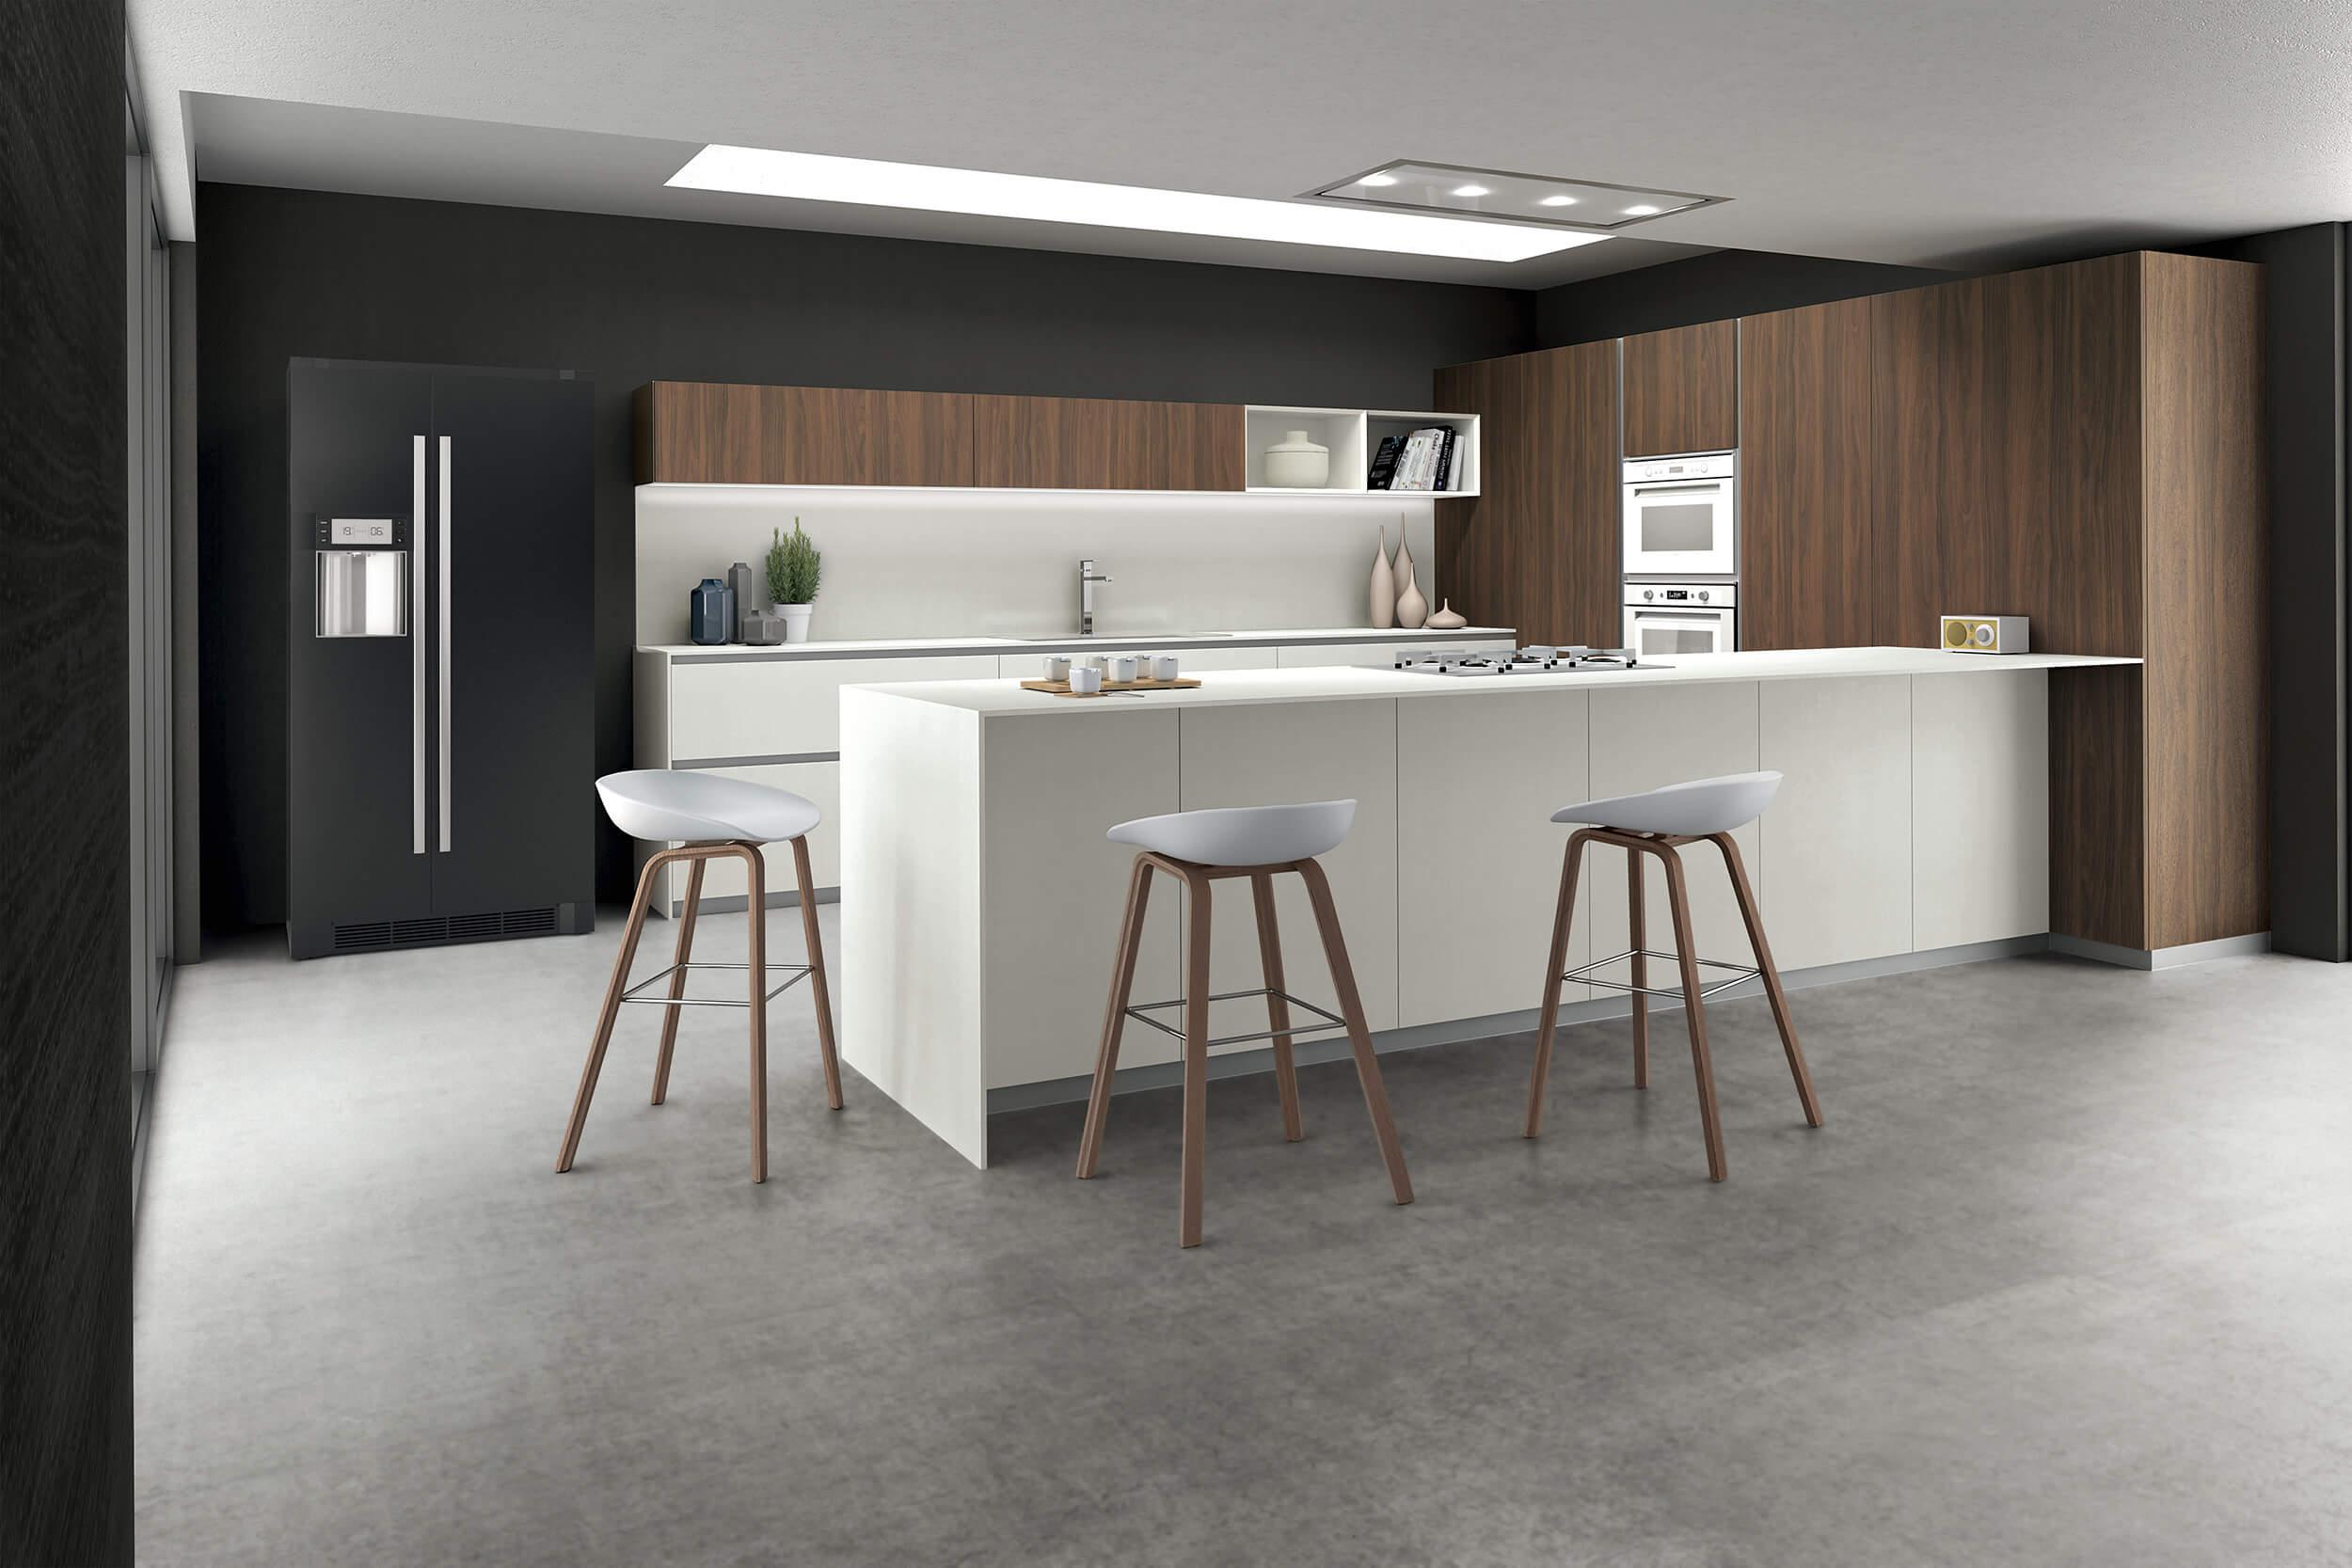 Come arredare una cucina moderna planet cucina - Arredare una cucina moderna ...